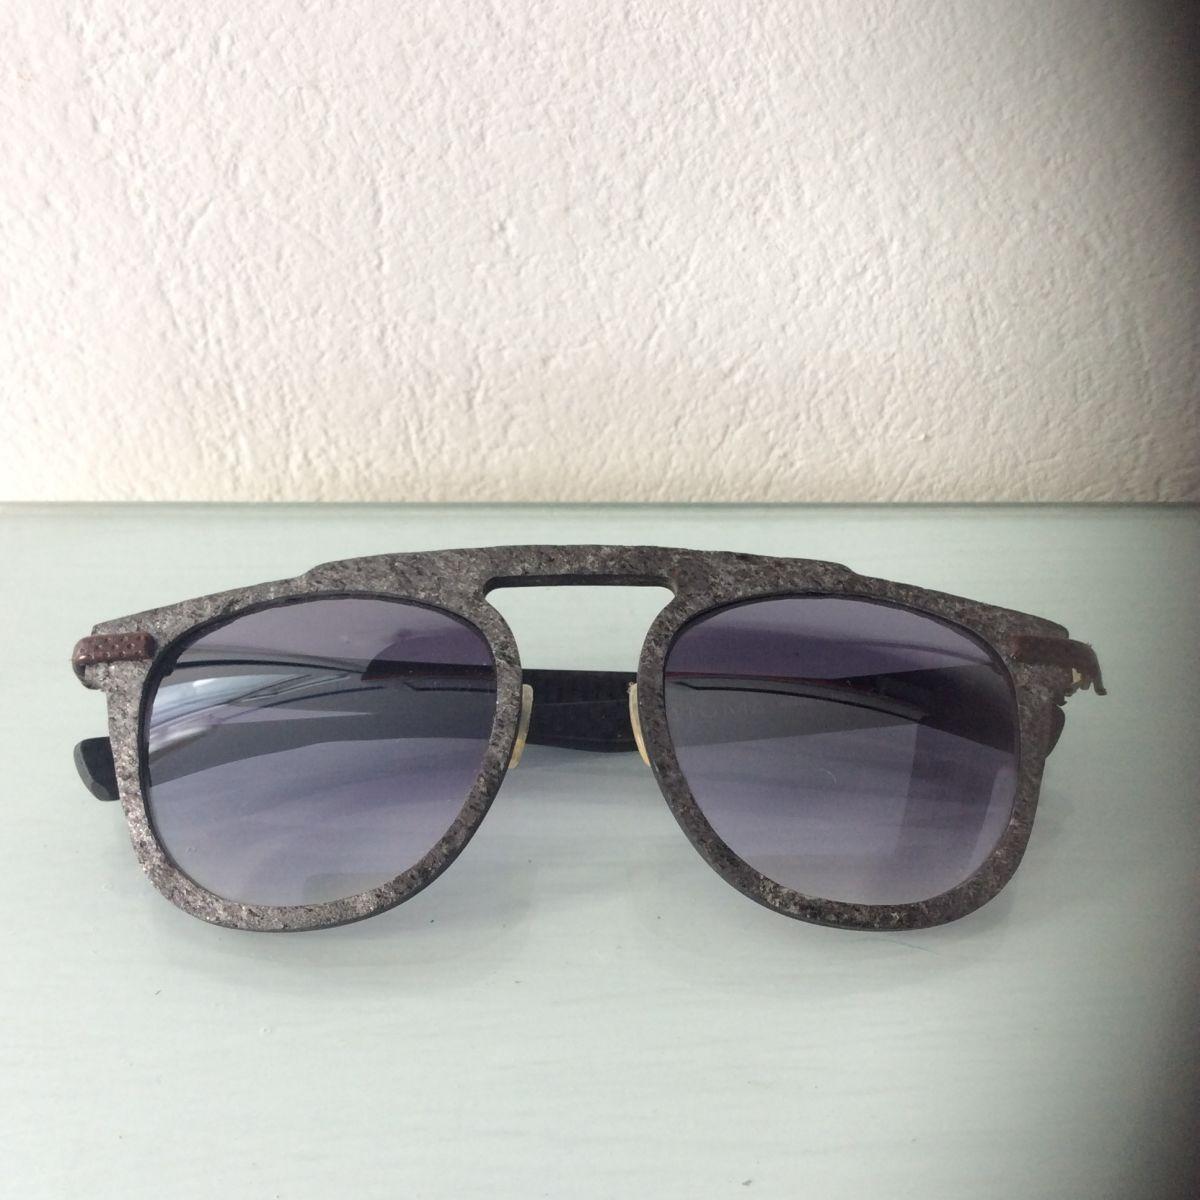 CATUMA Eyewear Carbon fiber gray granite - αγγελίες σε Πάρος - Vendora.gr 7a1ed1675b3